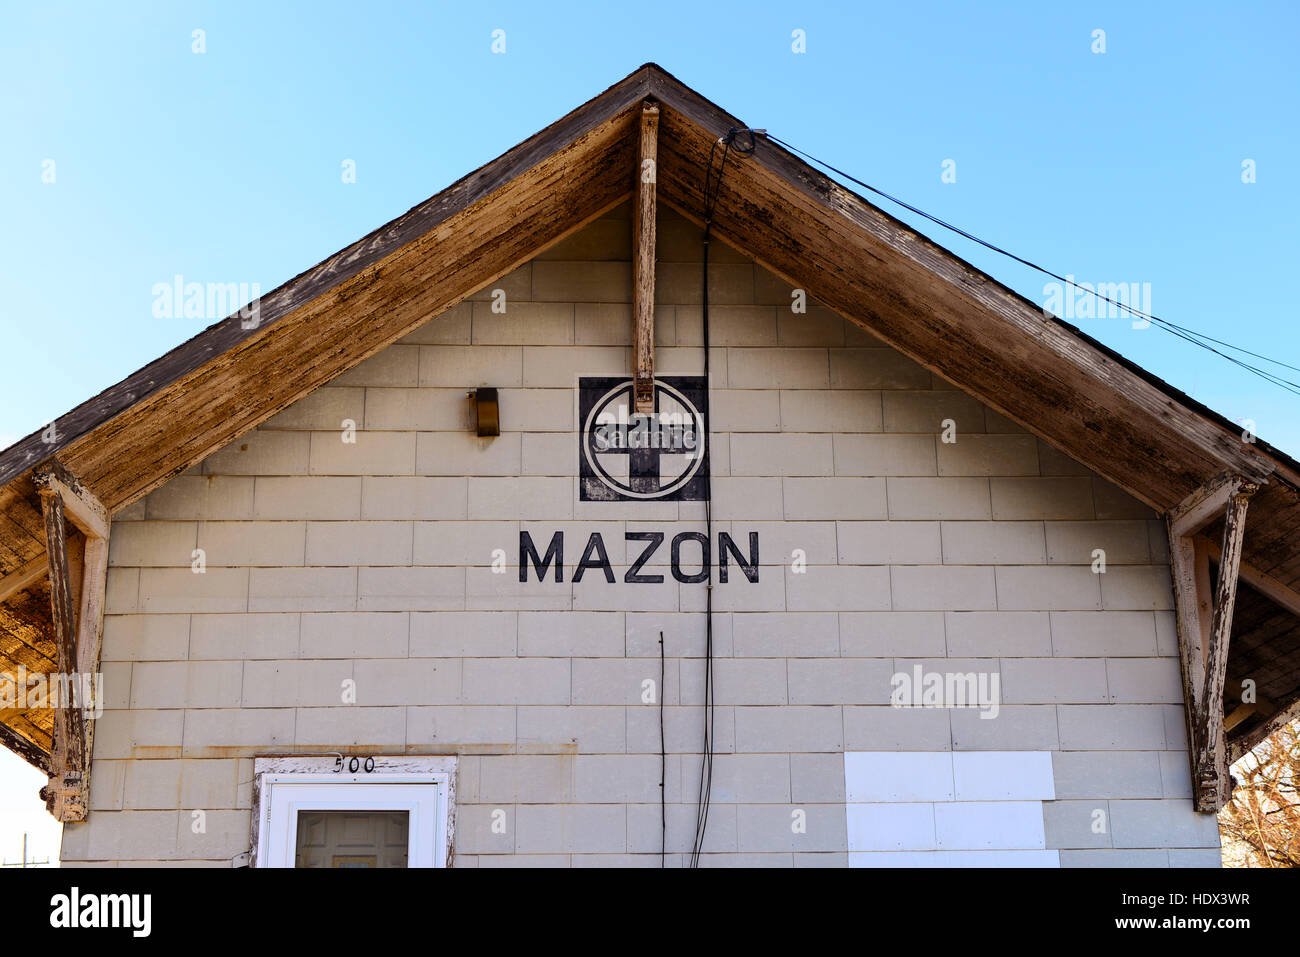 The Mazon, Illinois Sante Fe depot. - Stock Image